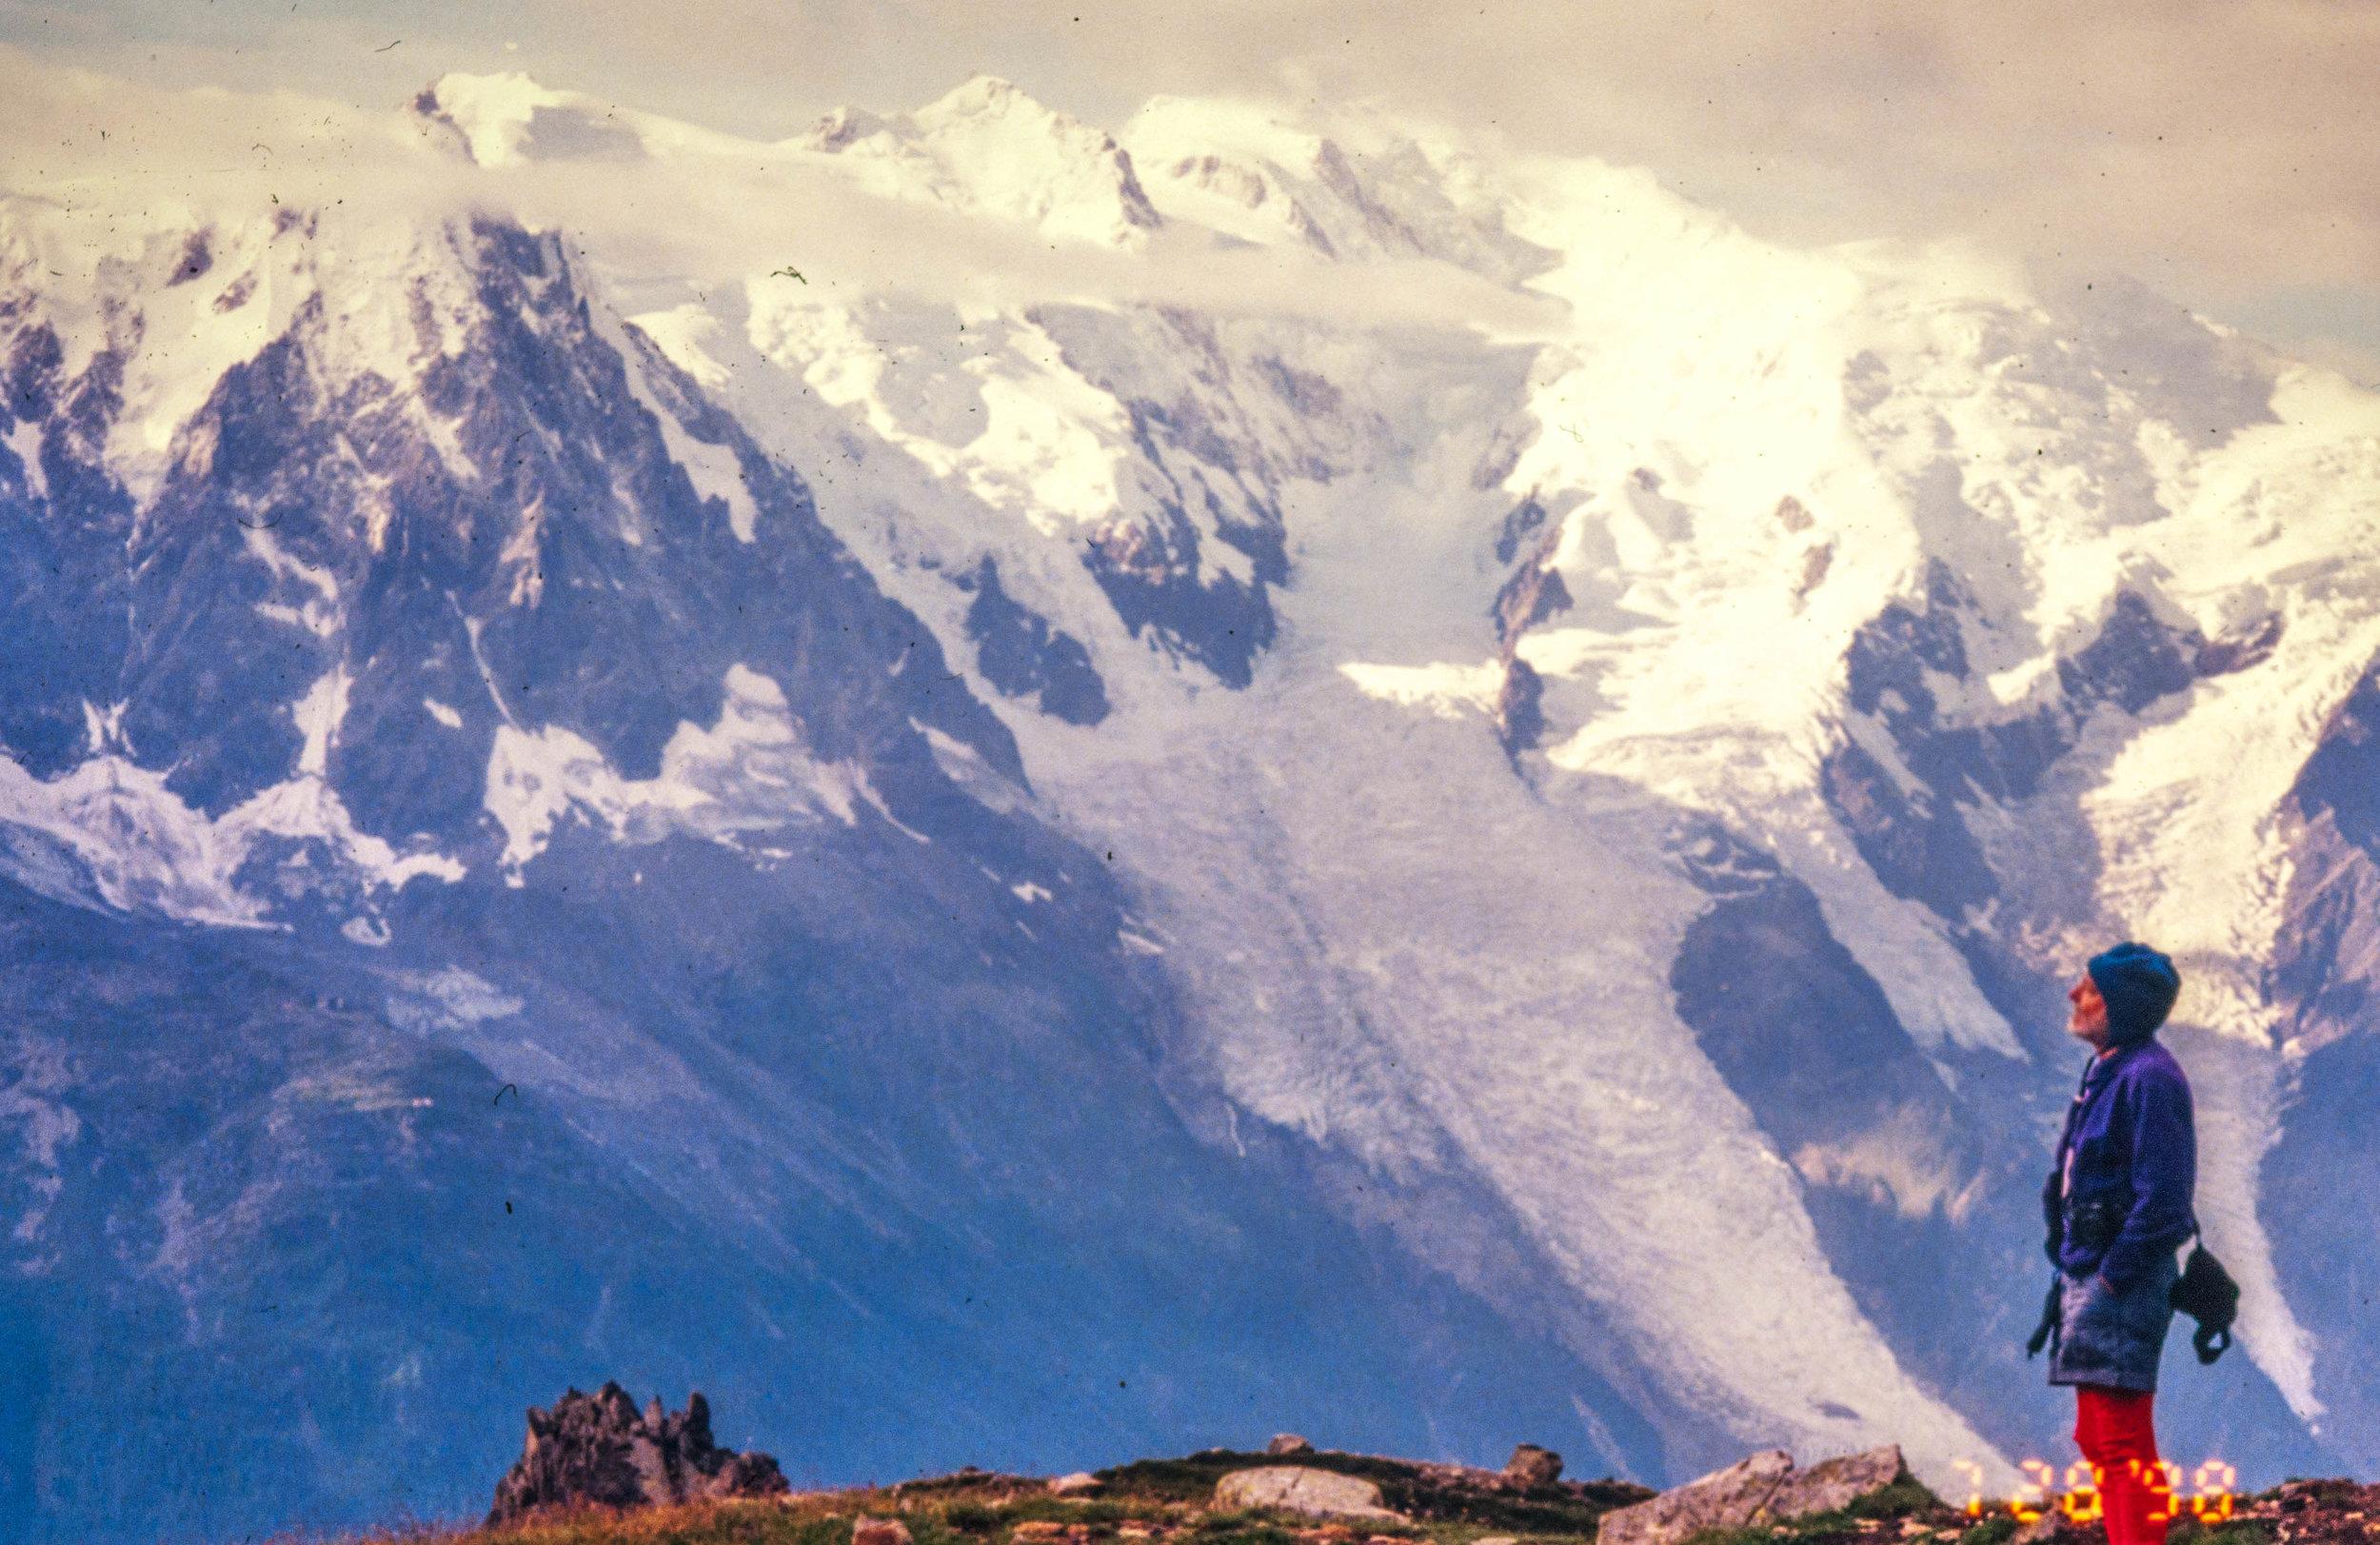 Bill Atkinson looks at the Alps above Chamonix 20 years ago.jpg